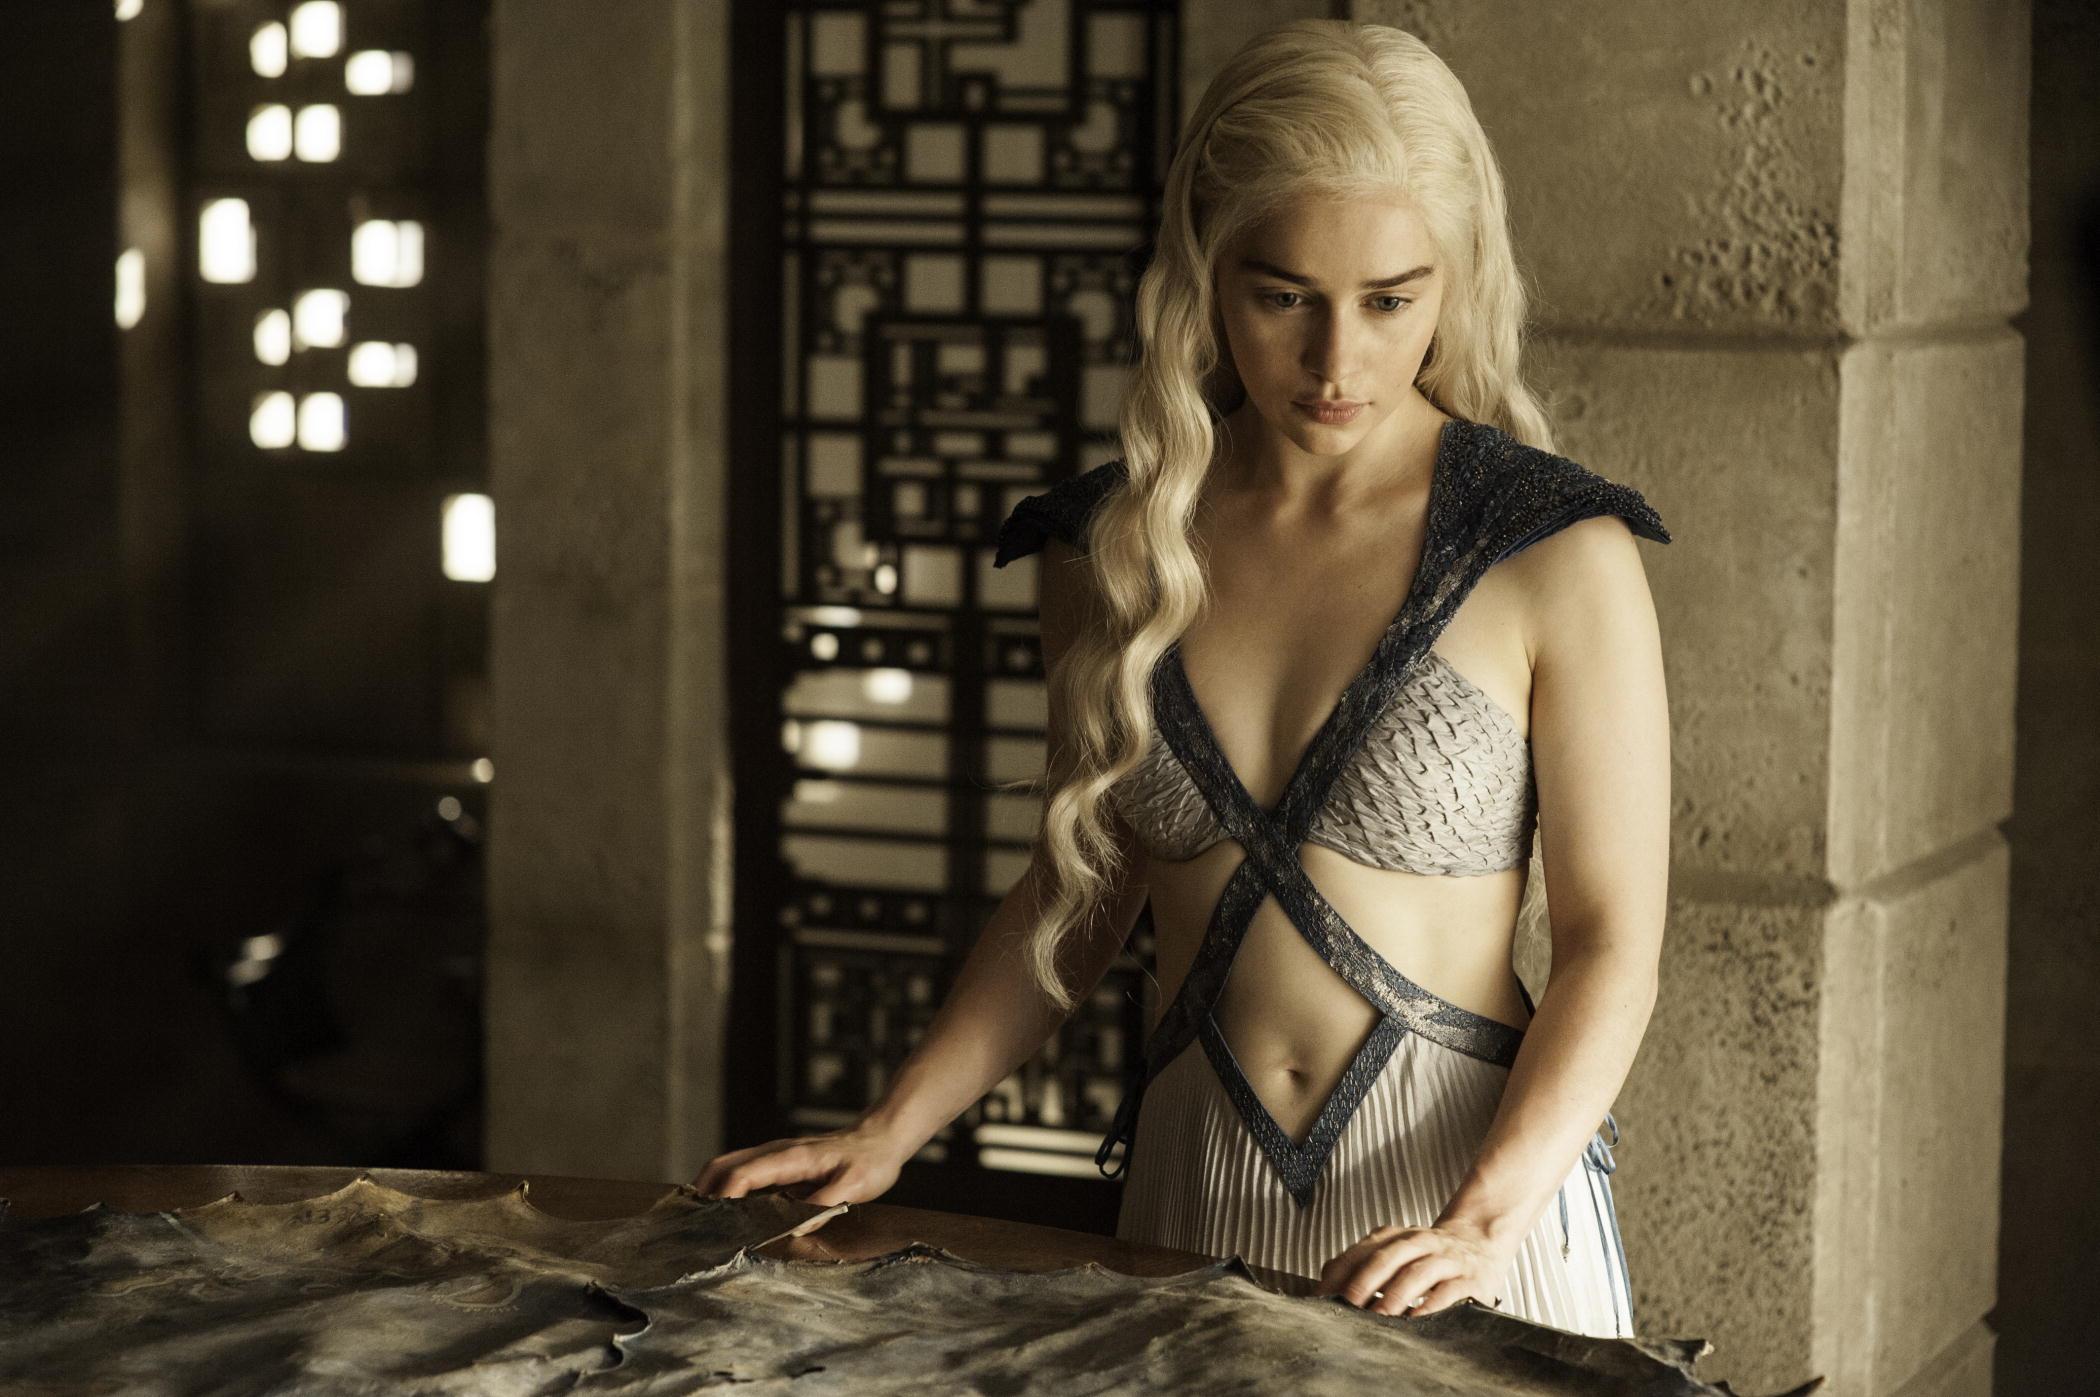 7 Daenerys Targaryen Quotes That Make Us Want To Be Better Women